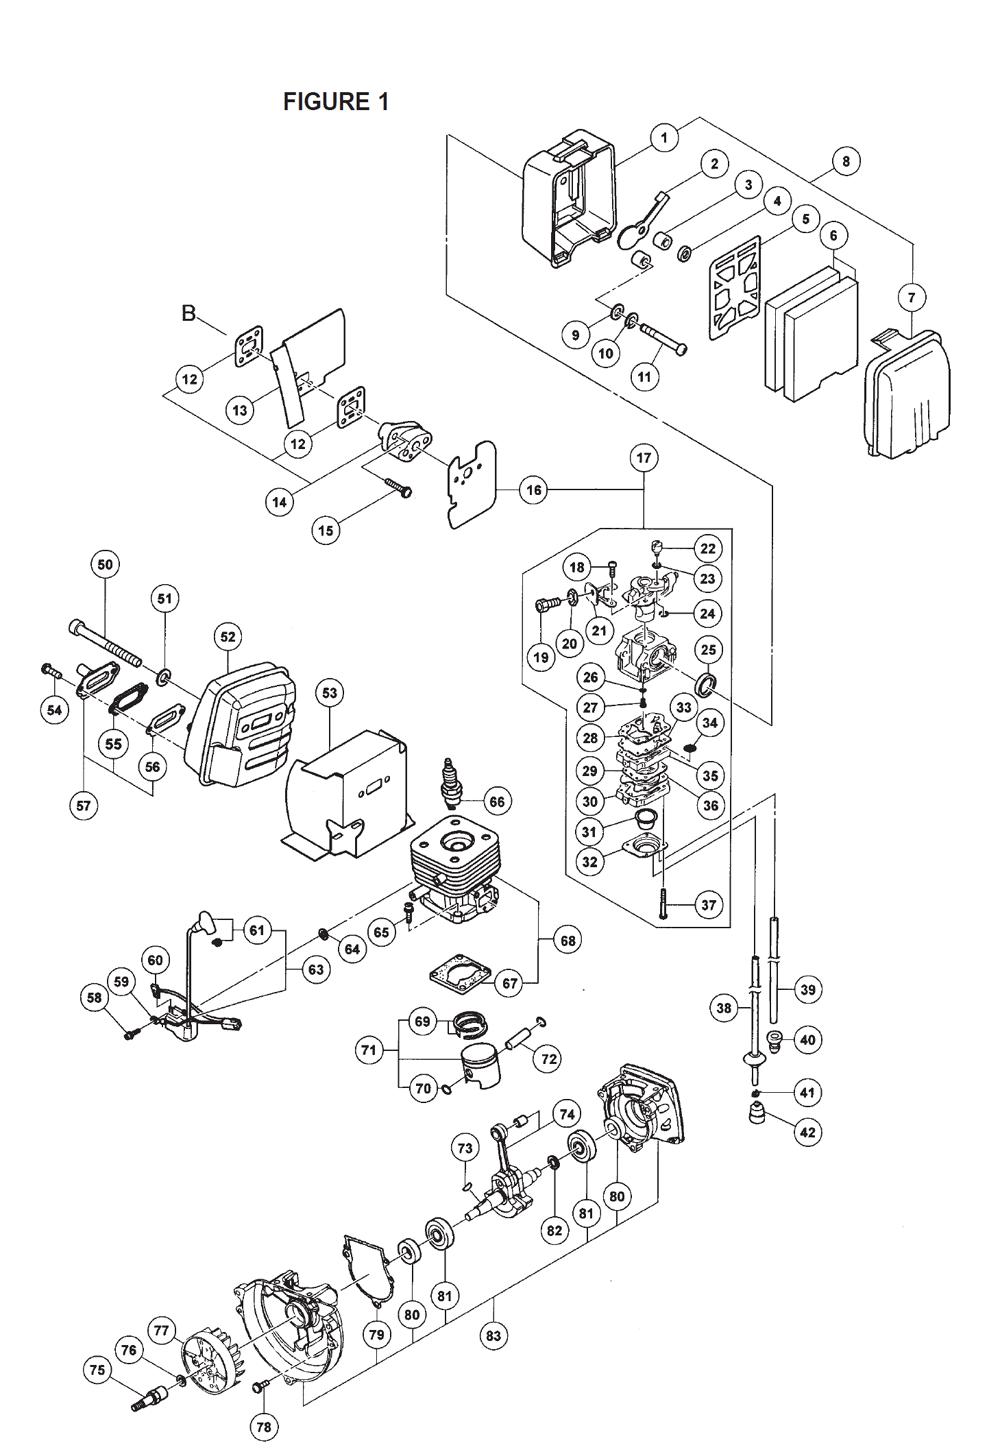 oscillating tool blades lowe u0026 39 s